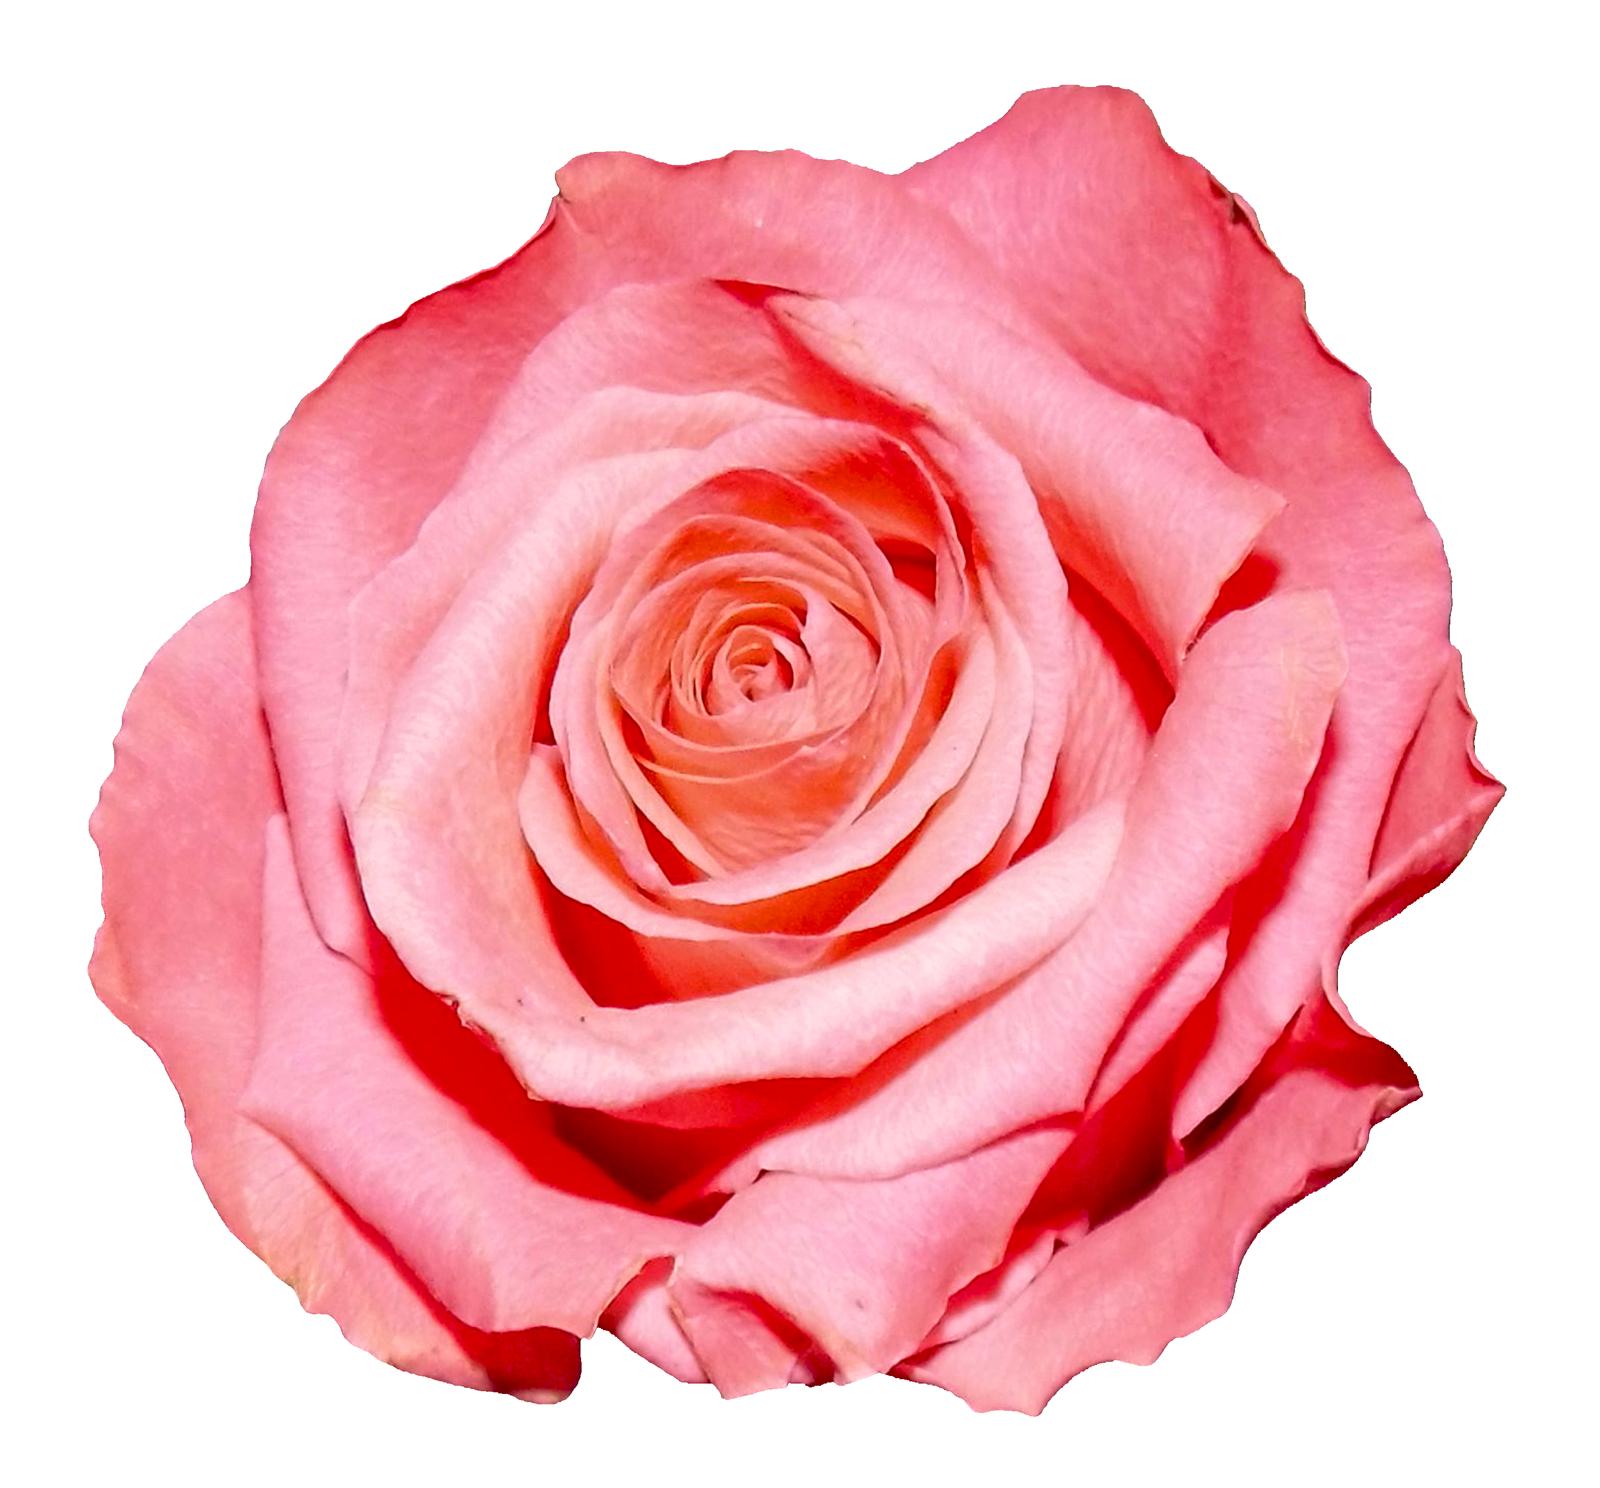 Rose Png Image Pink Rose Png Free Clip Art Rose